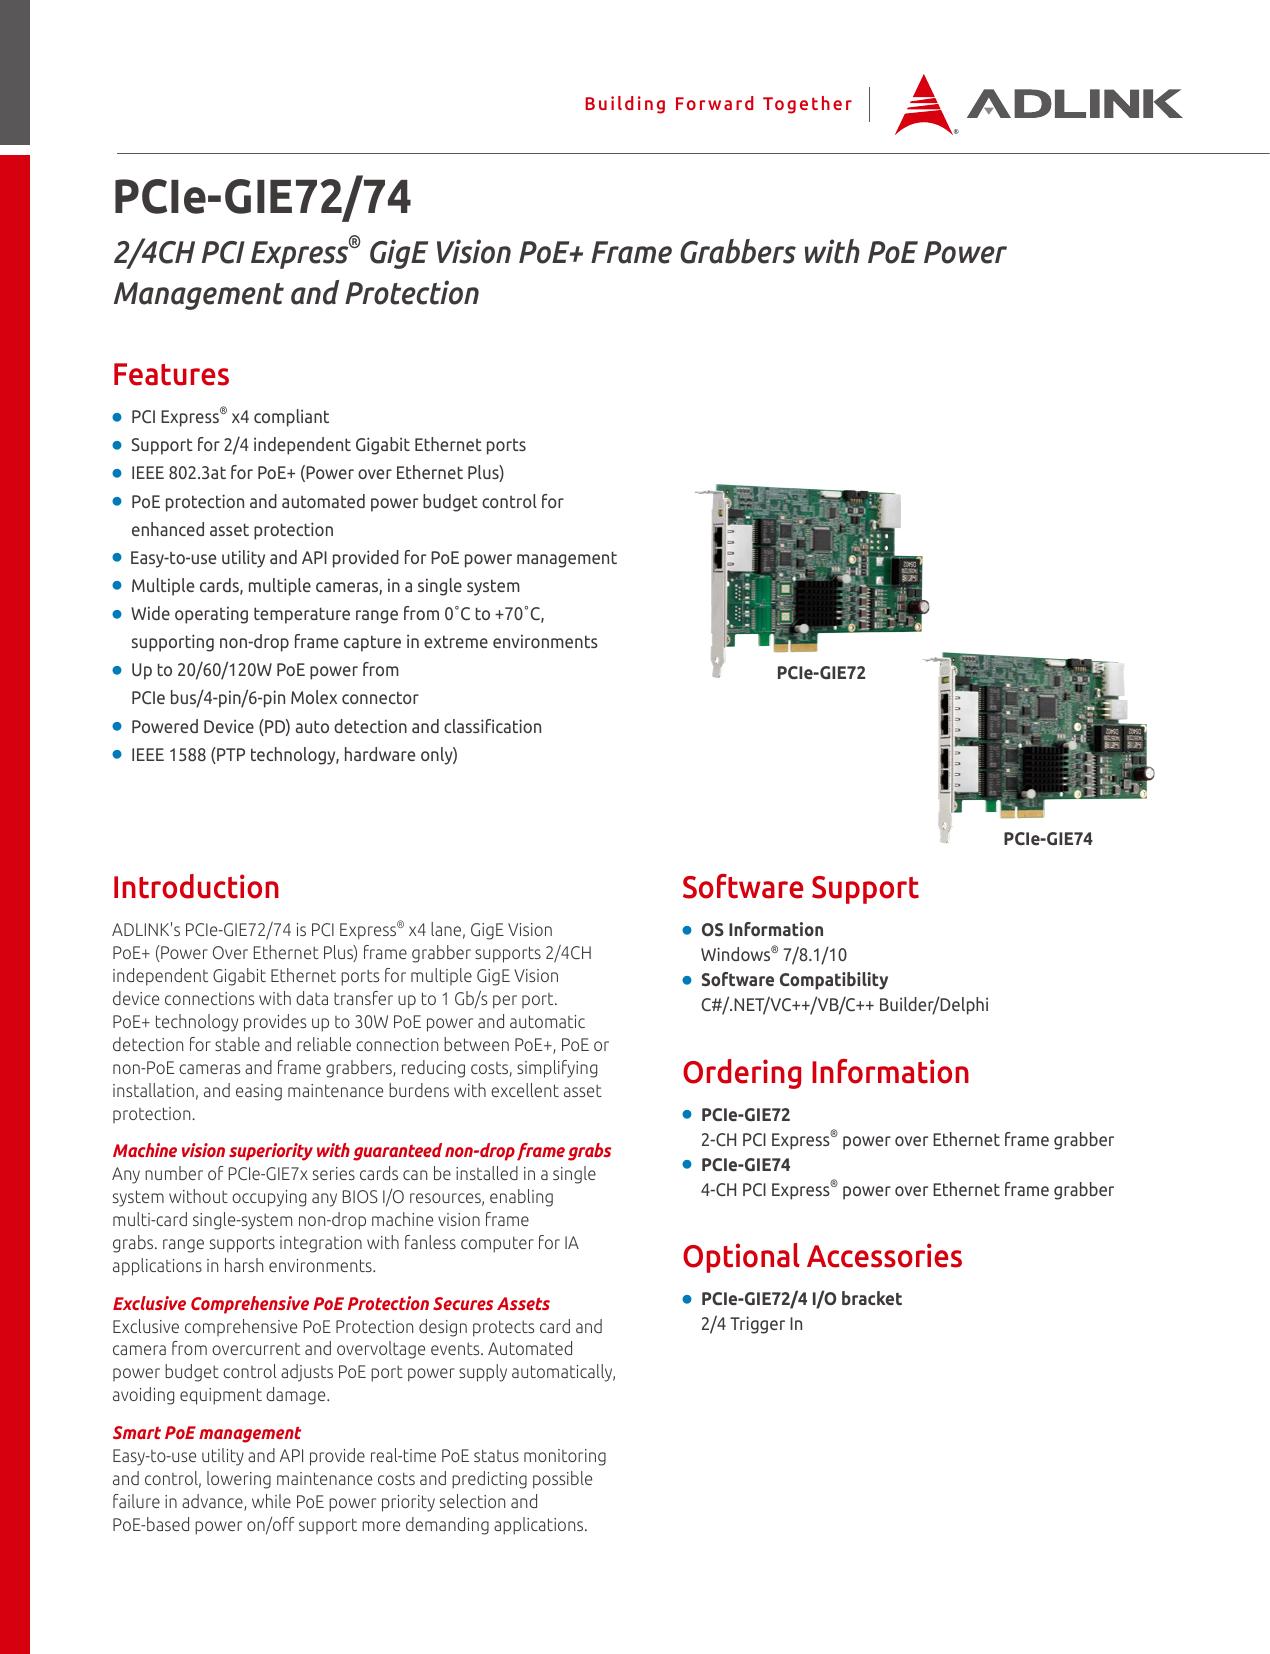 ADLINK PCIe-GIE74 POE Frame Grabber